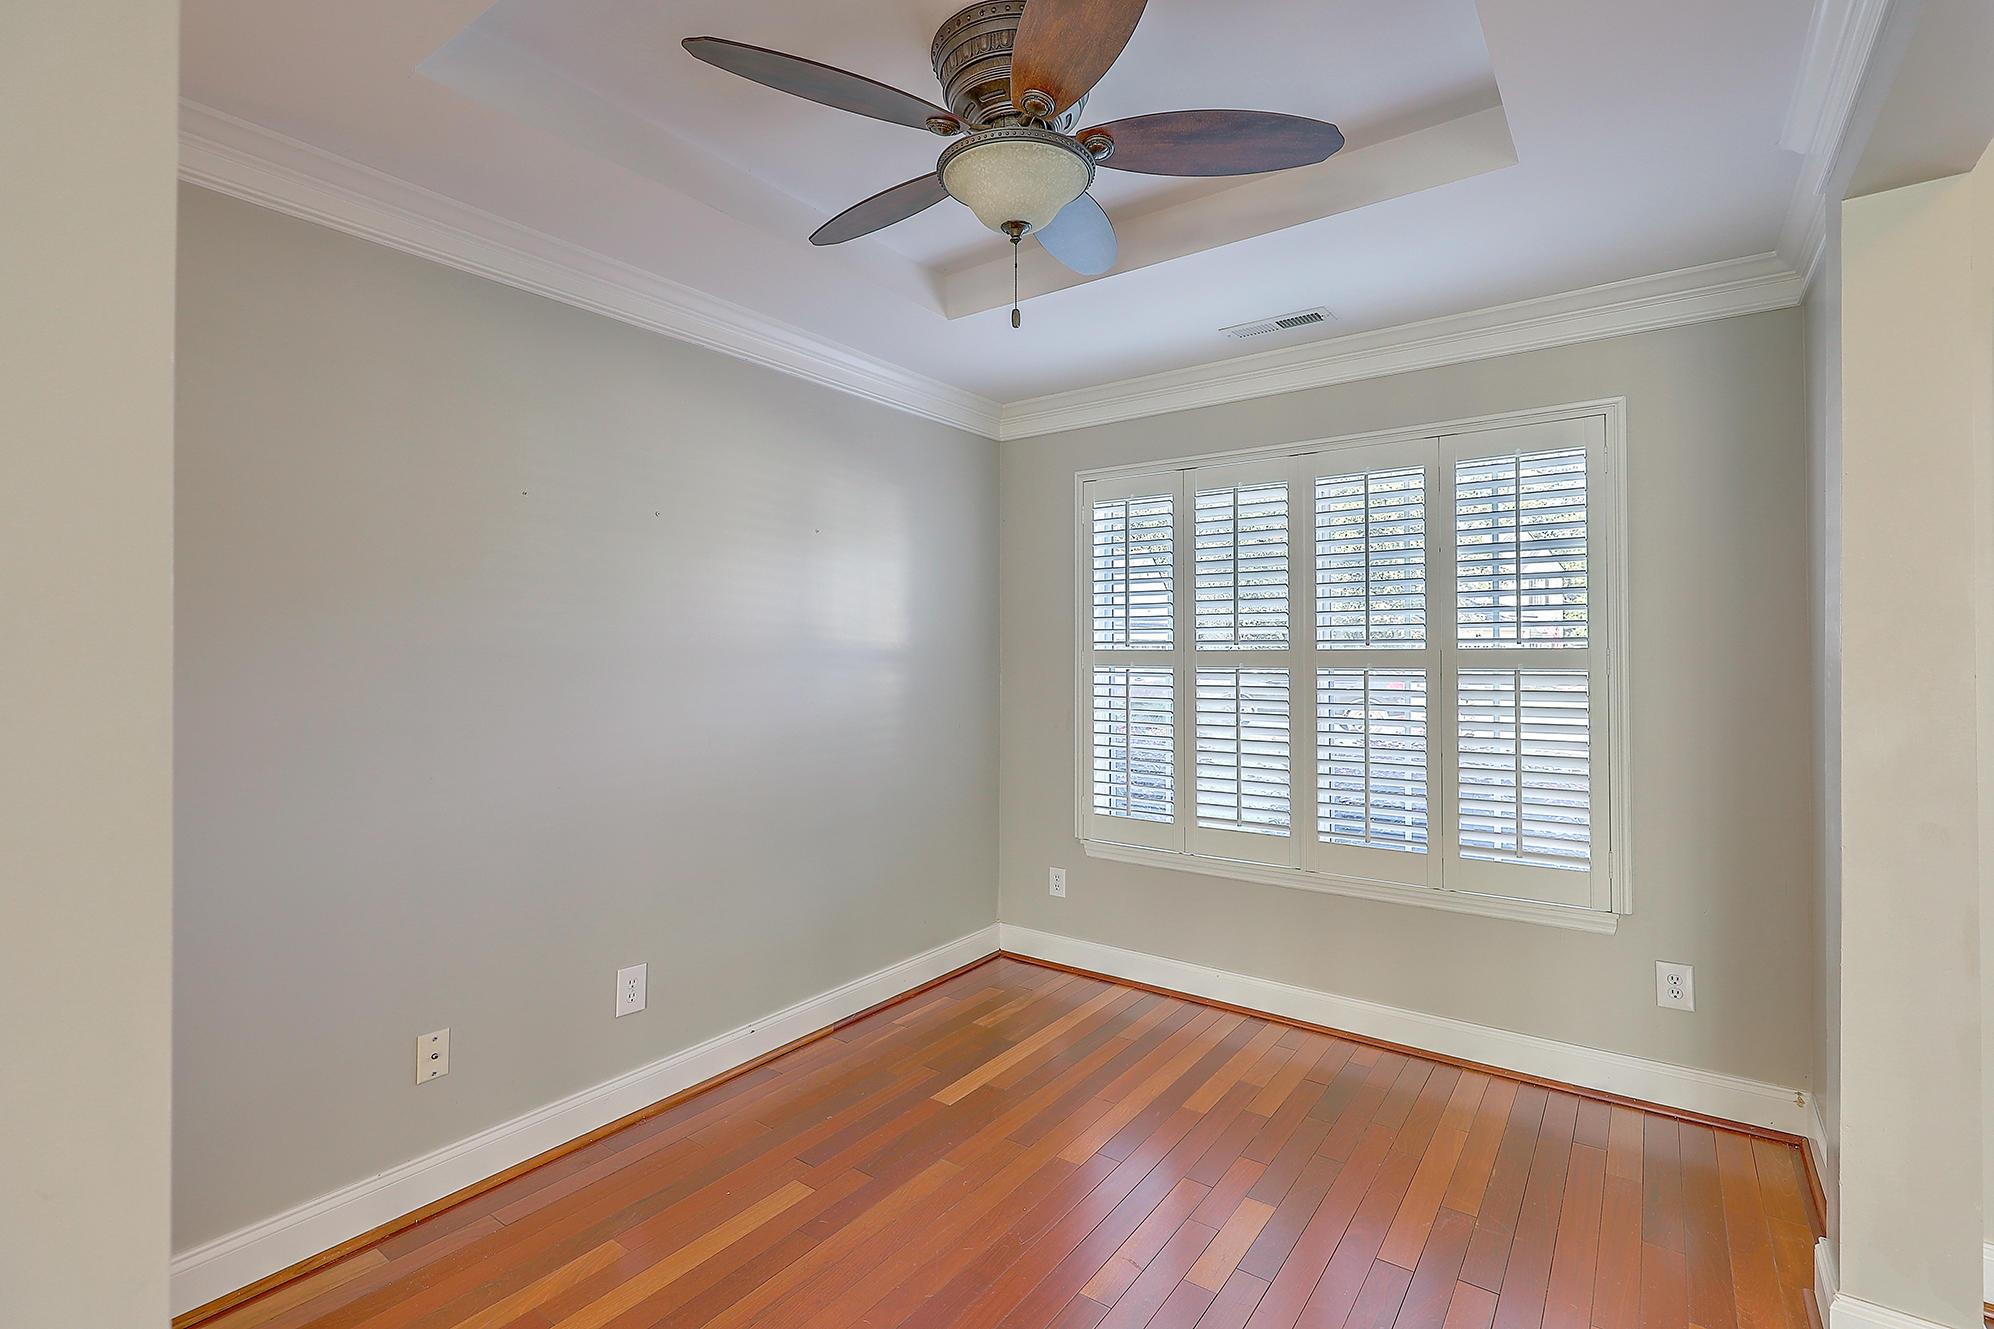 Planters Pointe Homes For Sale - 2740 Four Winds, Mount Pleasant, SC - 14